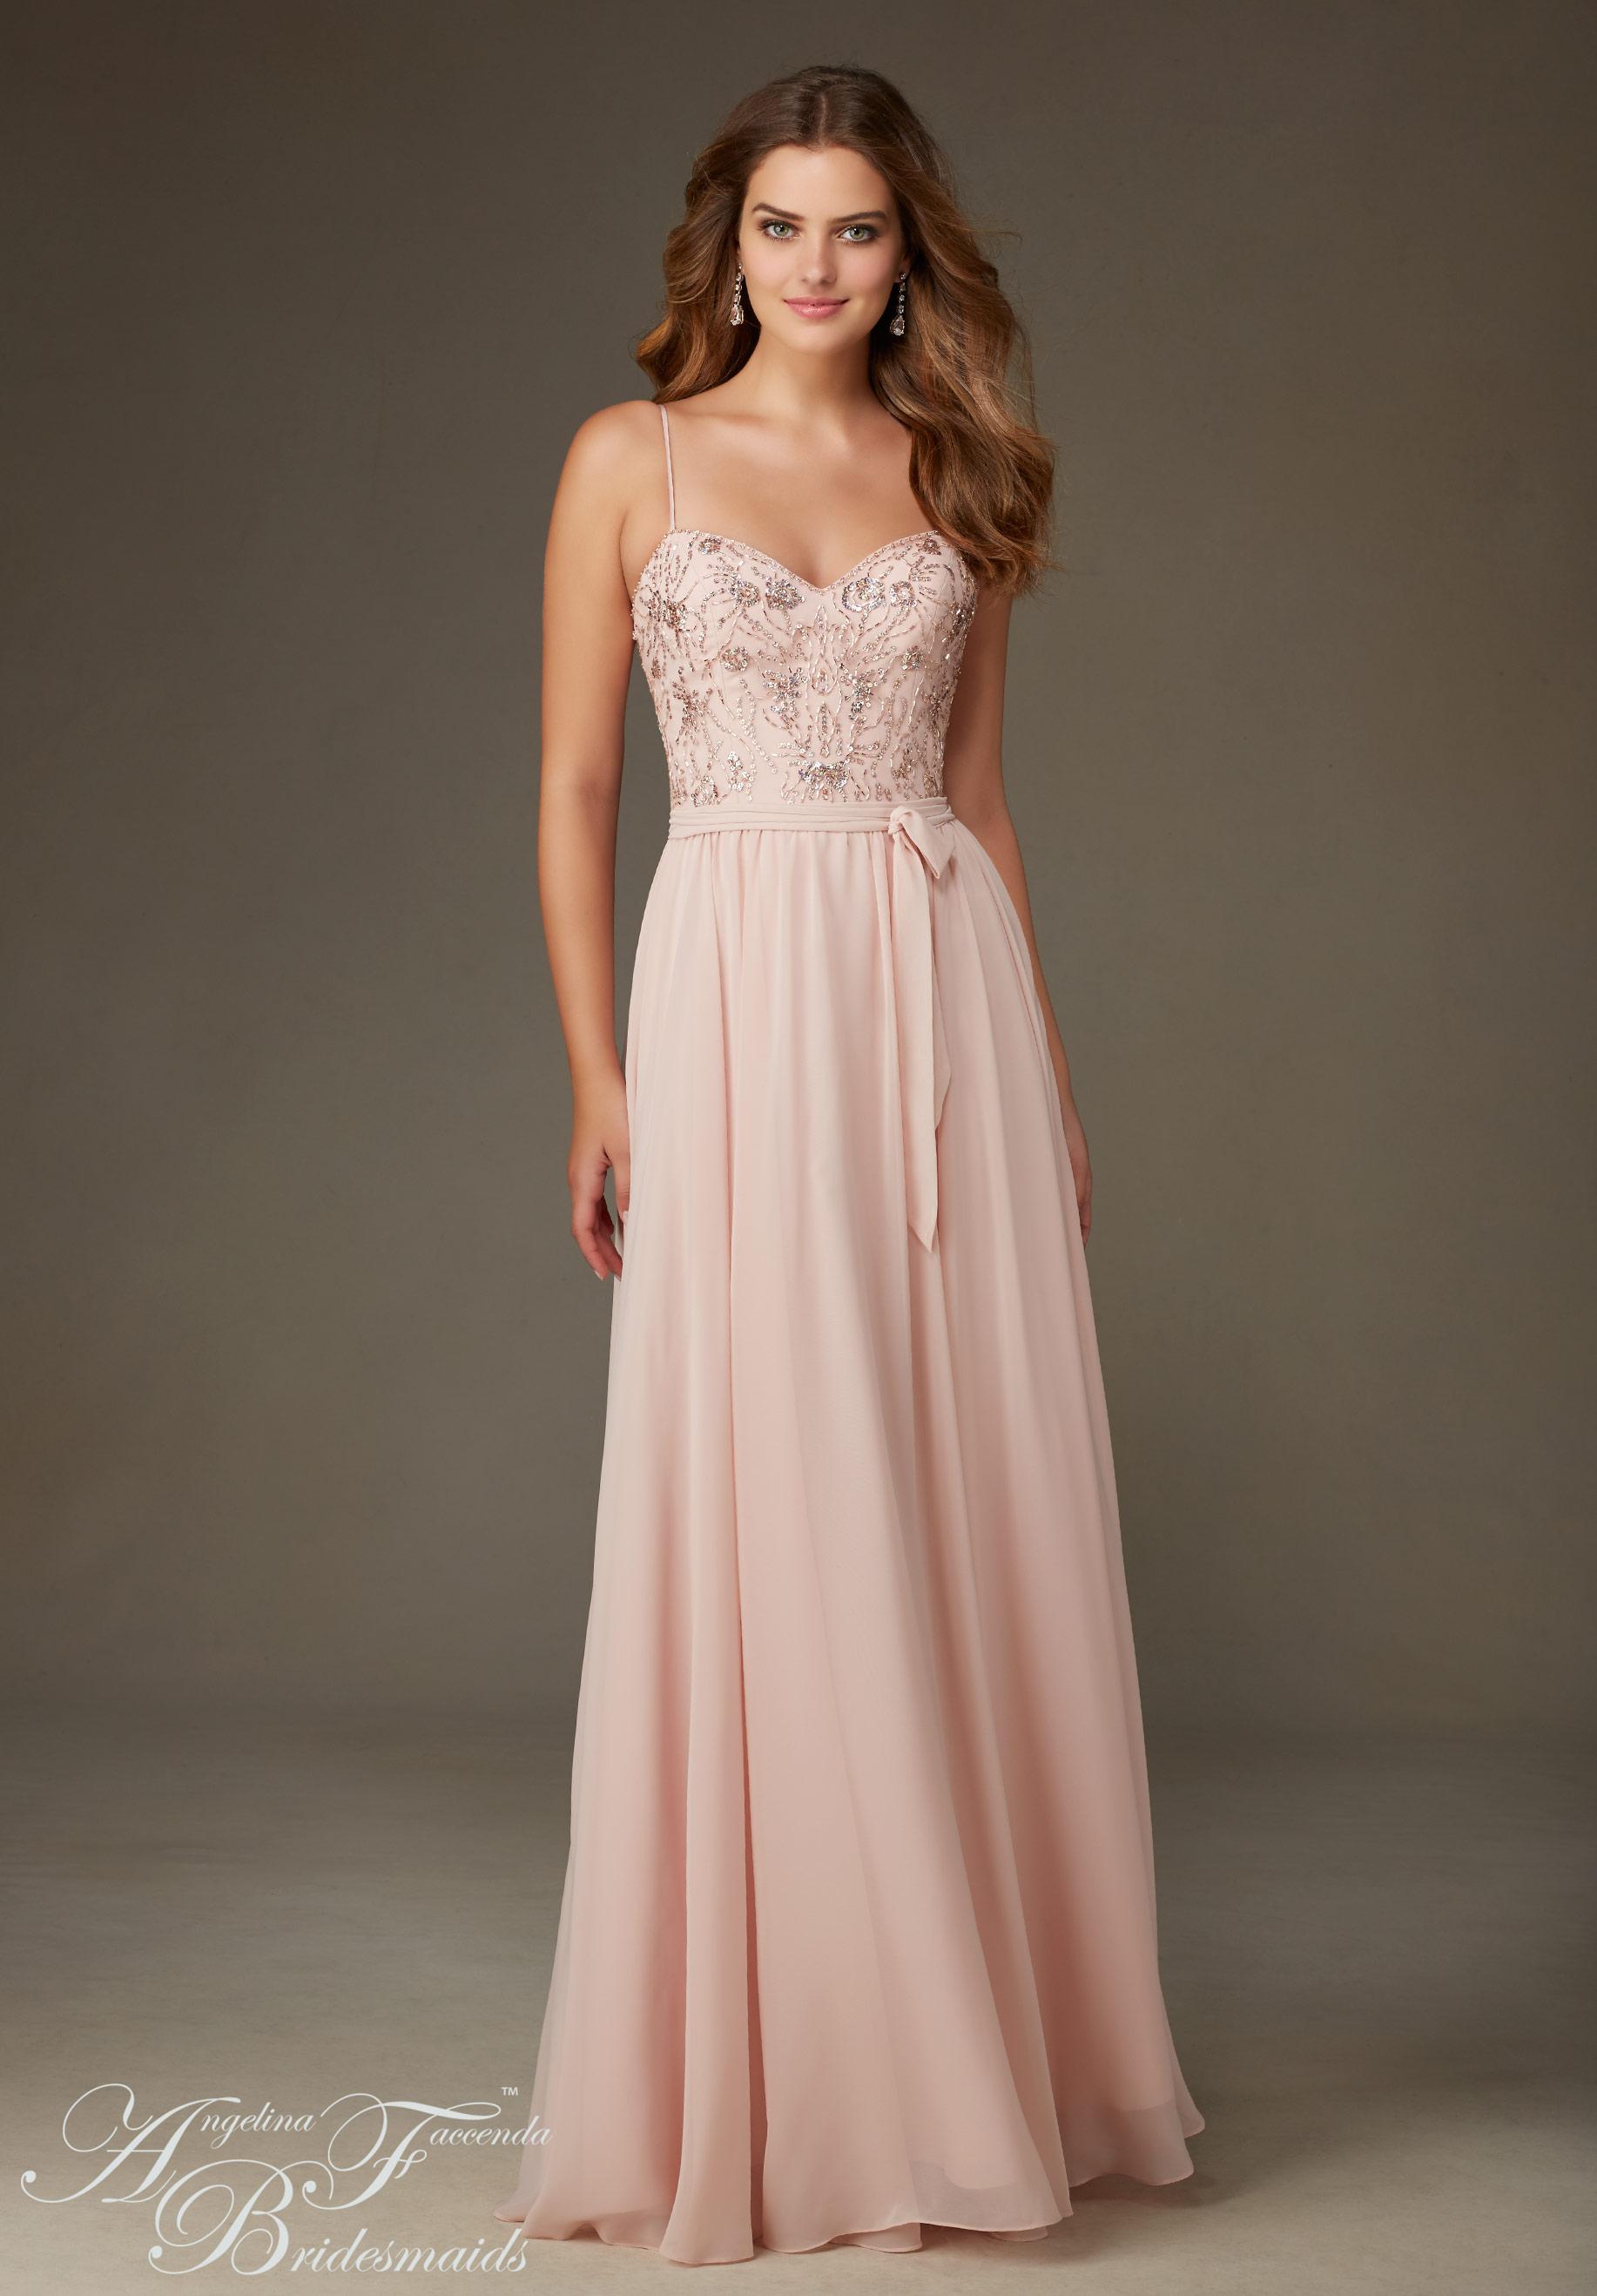 Bridesmaids - LuLu's Bridal